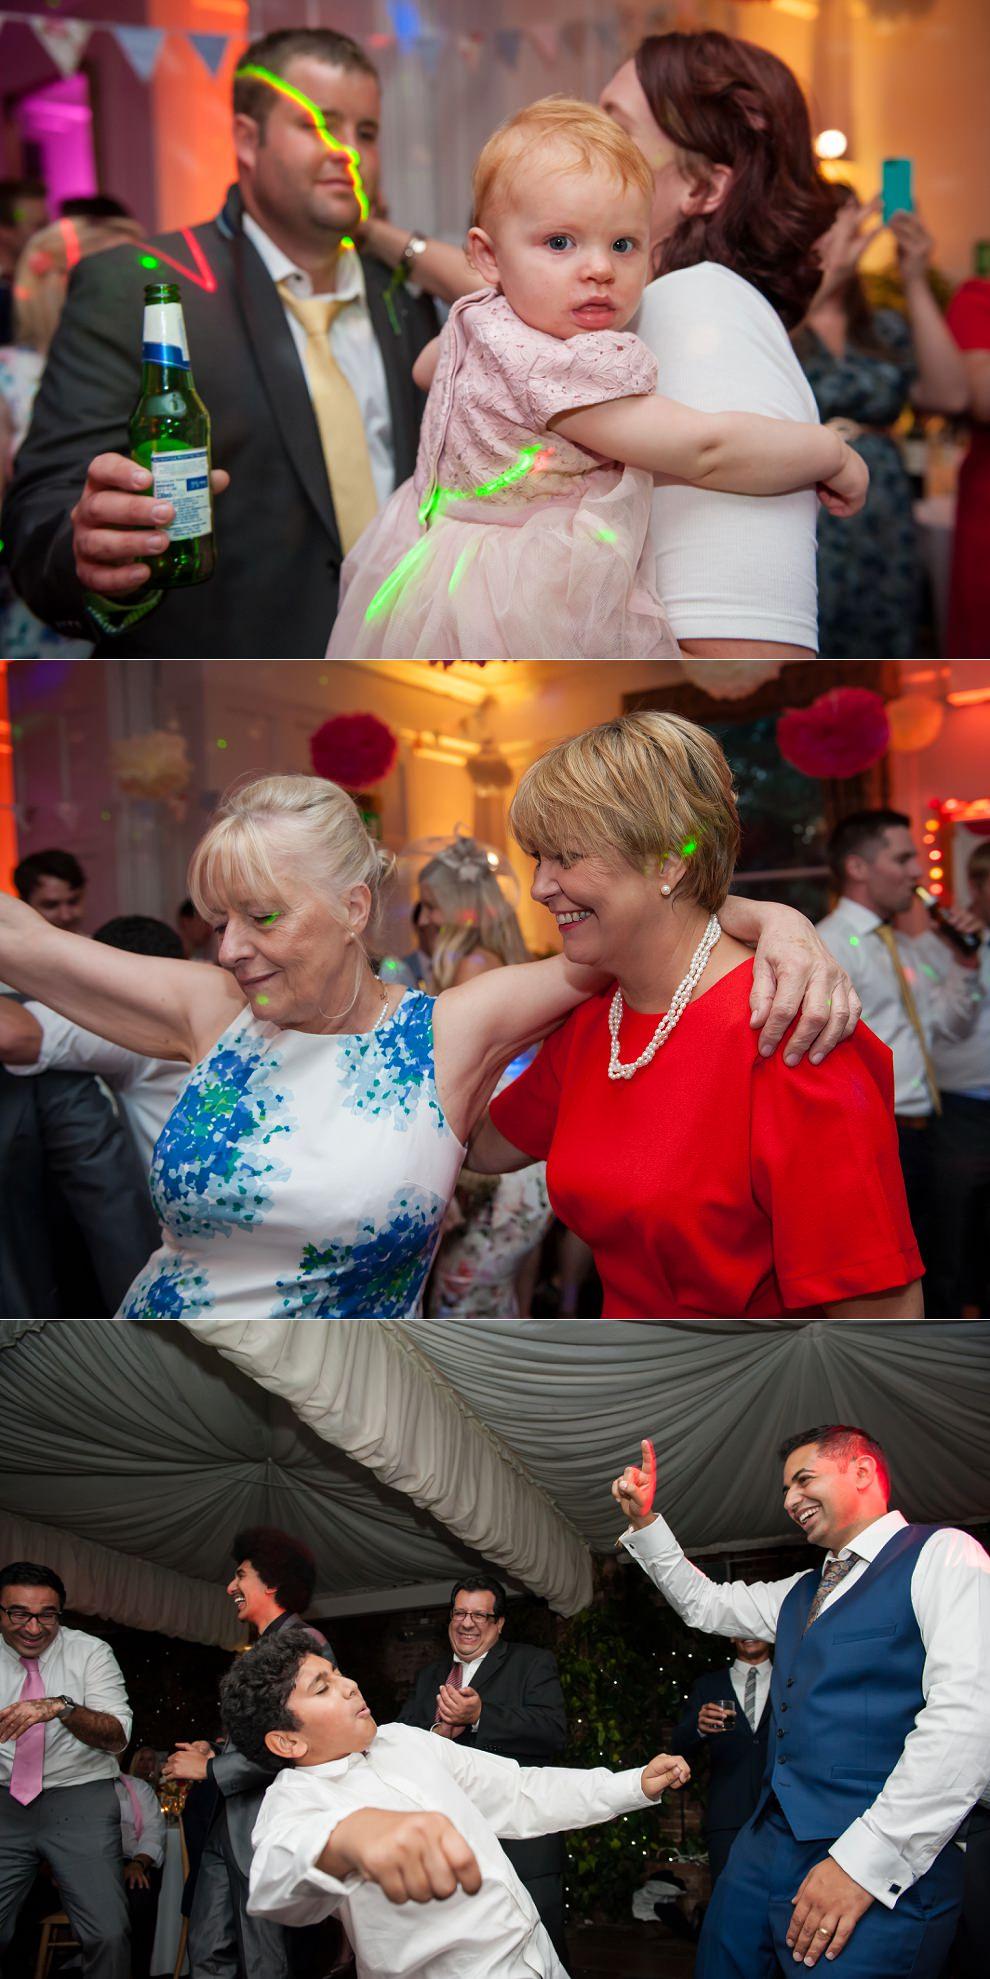 Best-wedding-photos-UK-2015-185